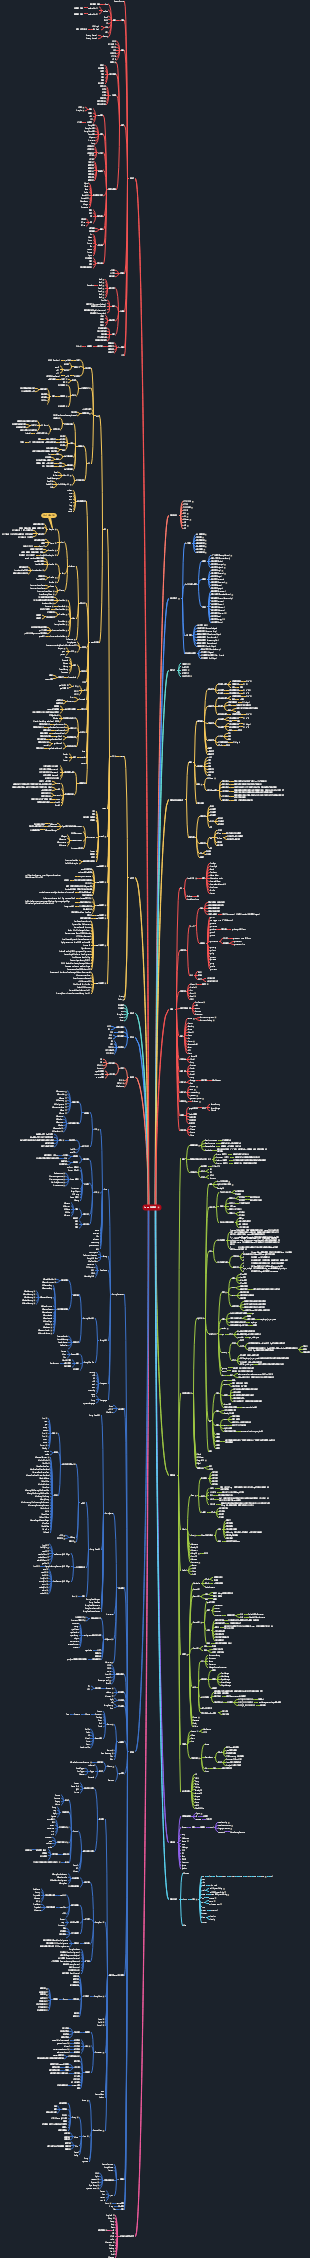 Java技能树